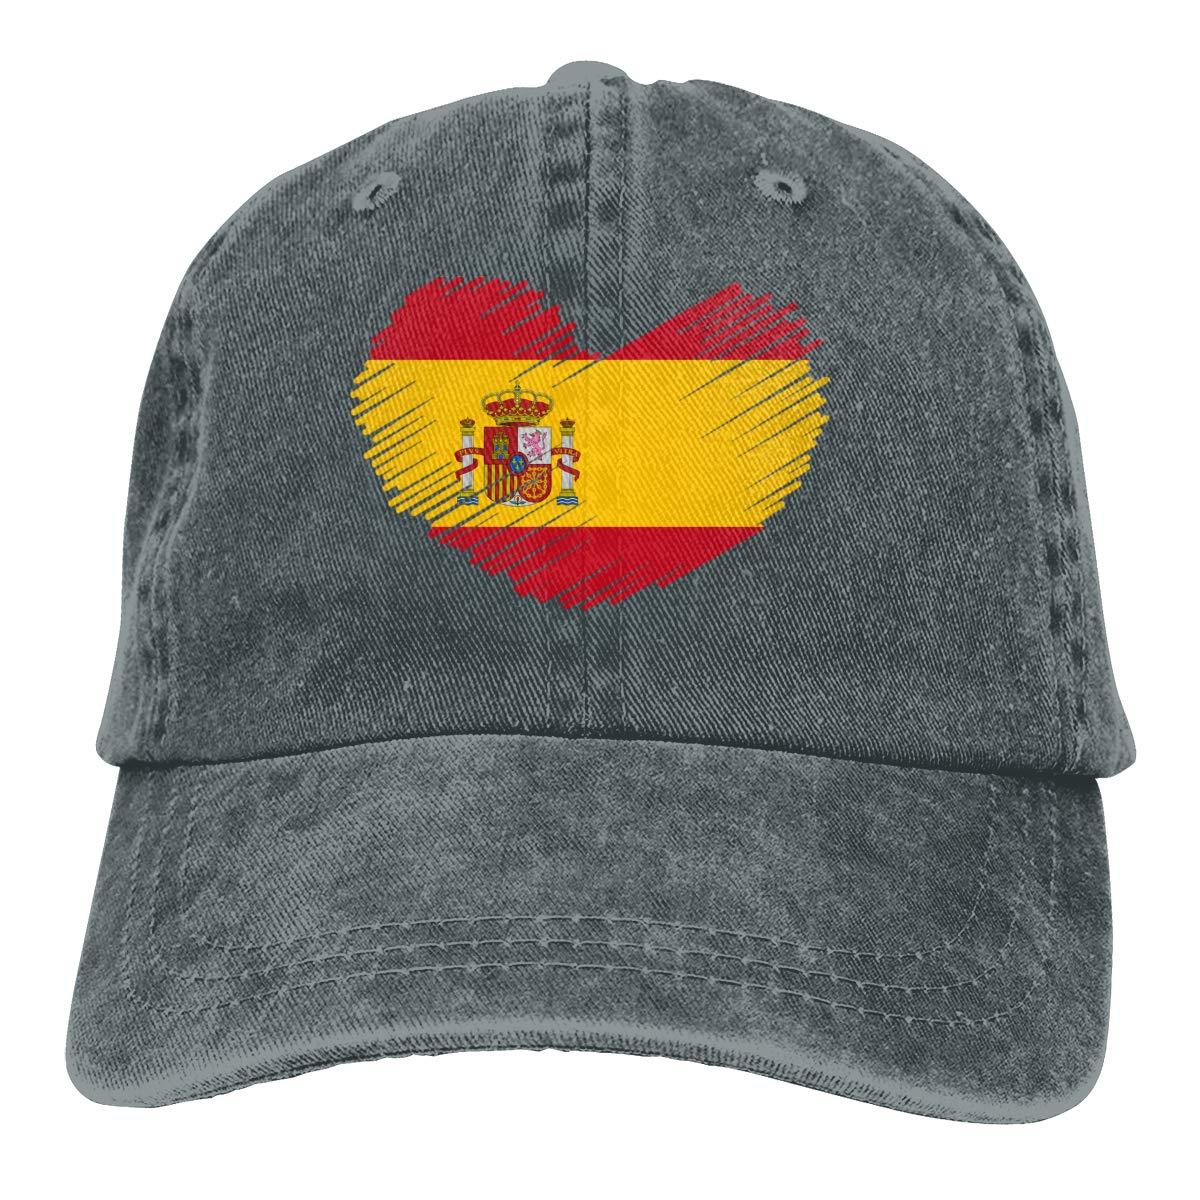 Gorra de béisbol de Denim teñida con hilo ajustable con bandera de España en forma de corazón gorra de hip hop